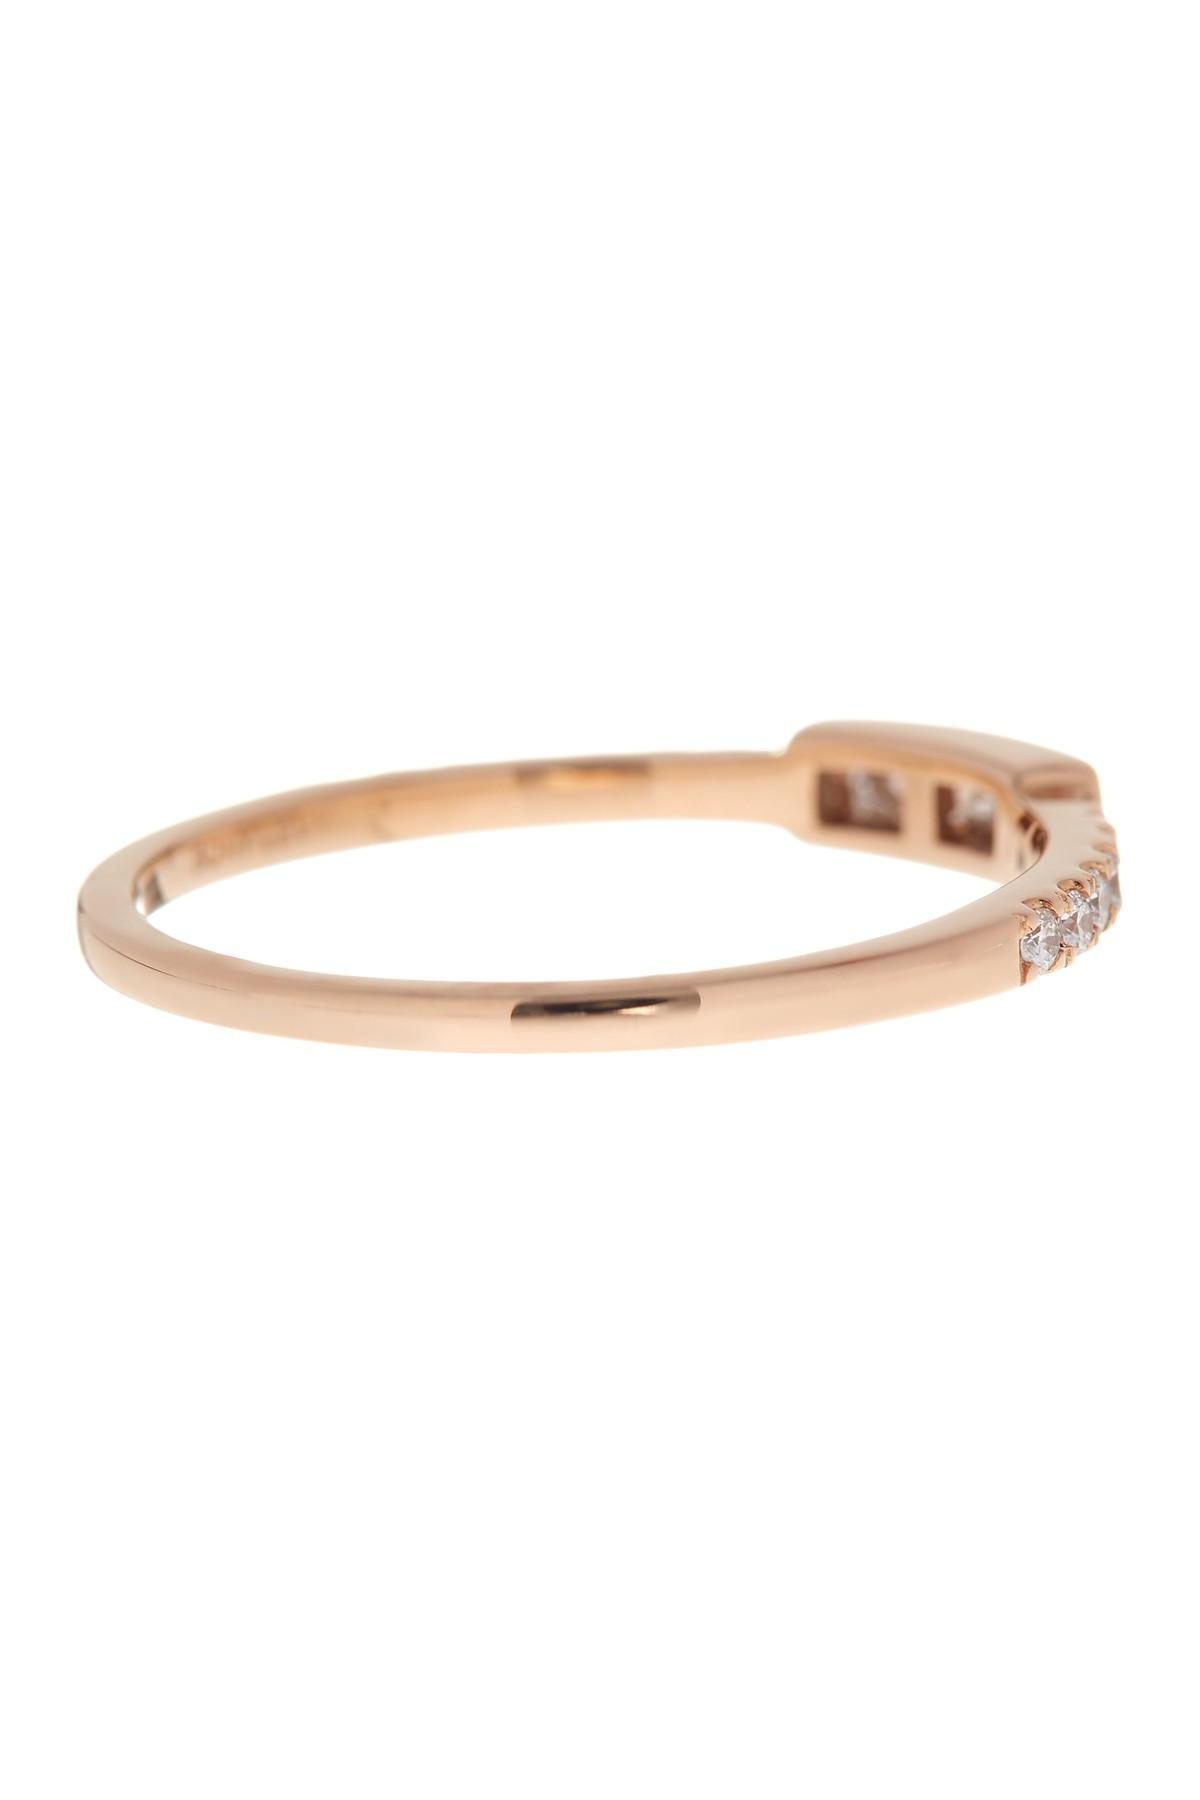 Nordstrom Rack Diamond Rings